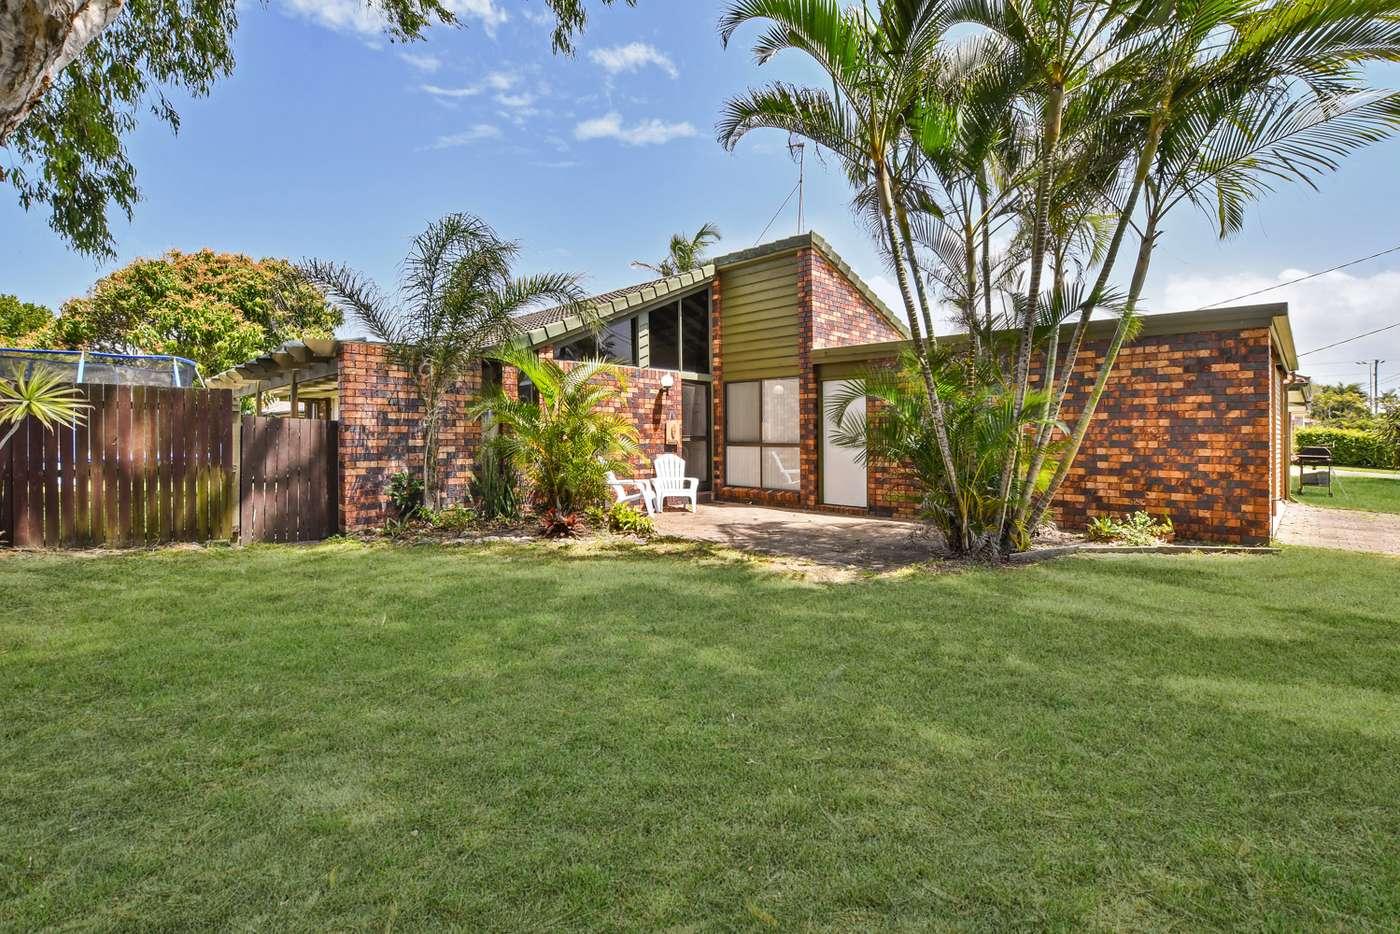 Main view of Homely house listing, 39 Kookaburra Crescent, Bokarina QLD 4575